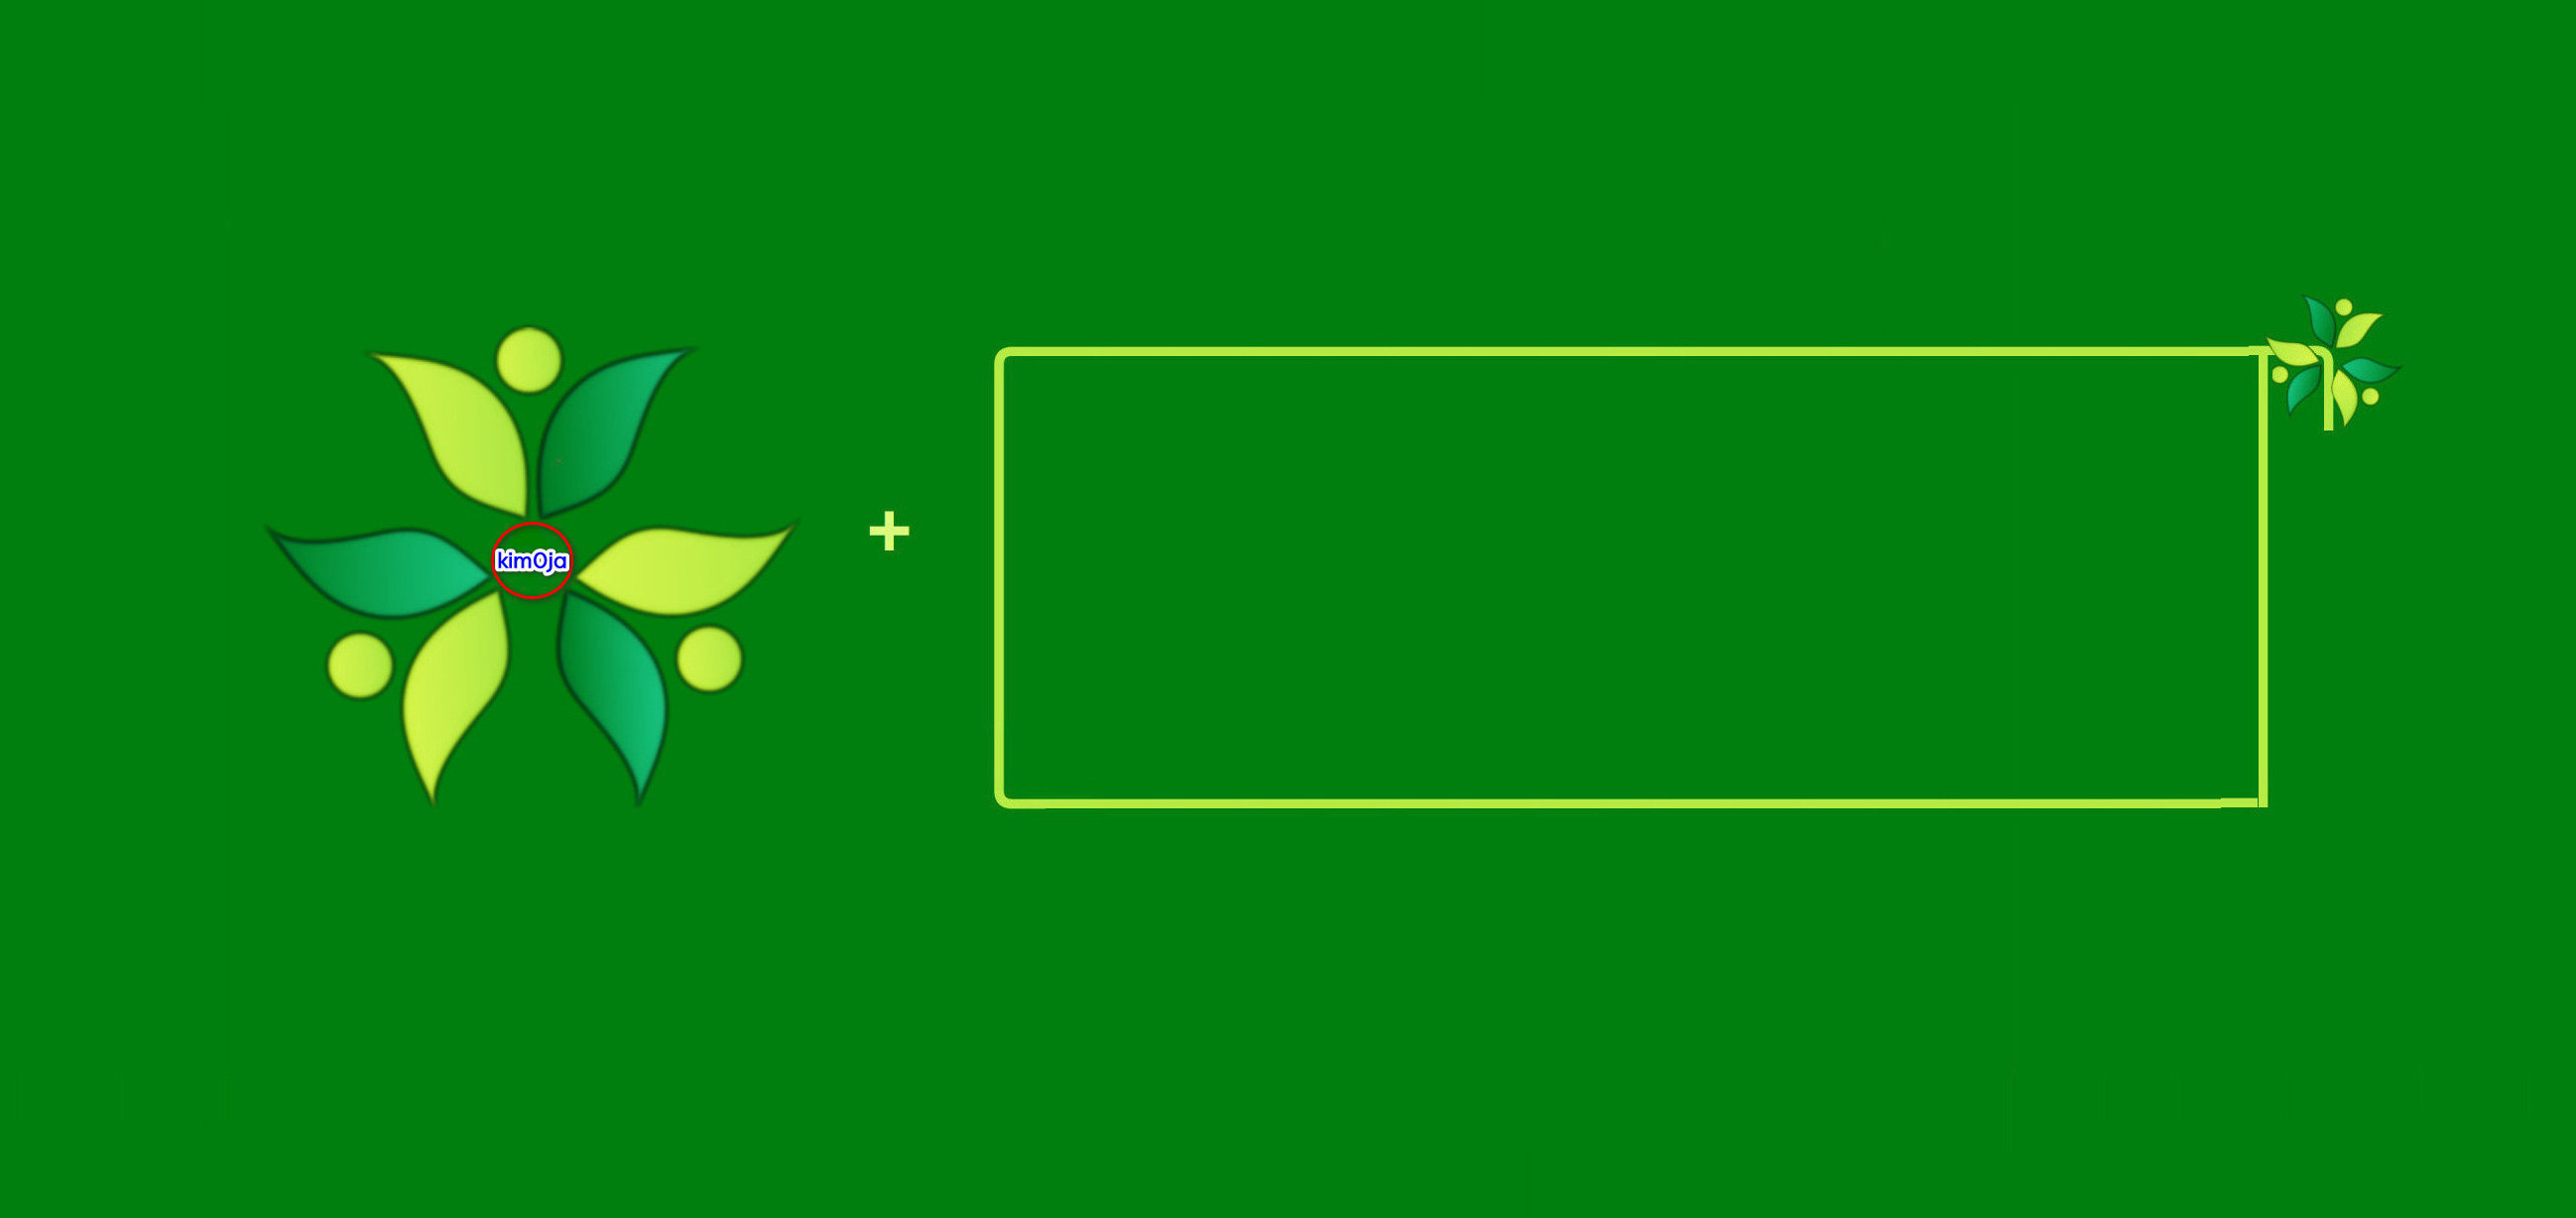 ventoy-green-theme- DOXA + 00.jpg